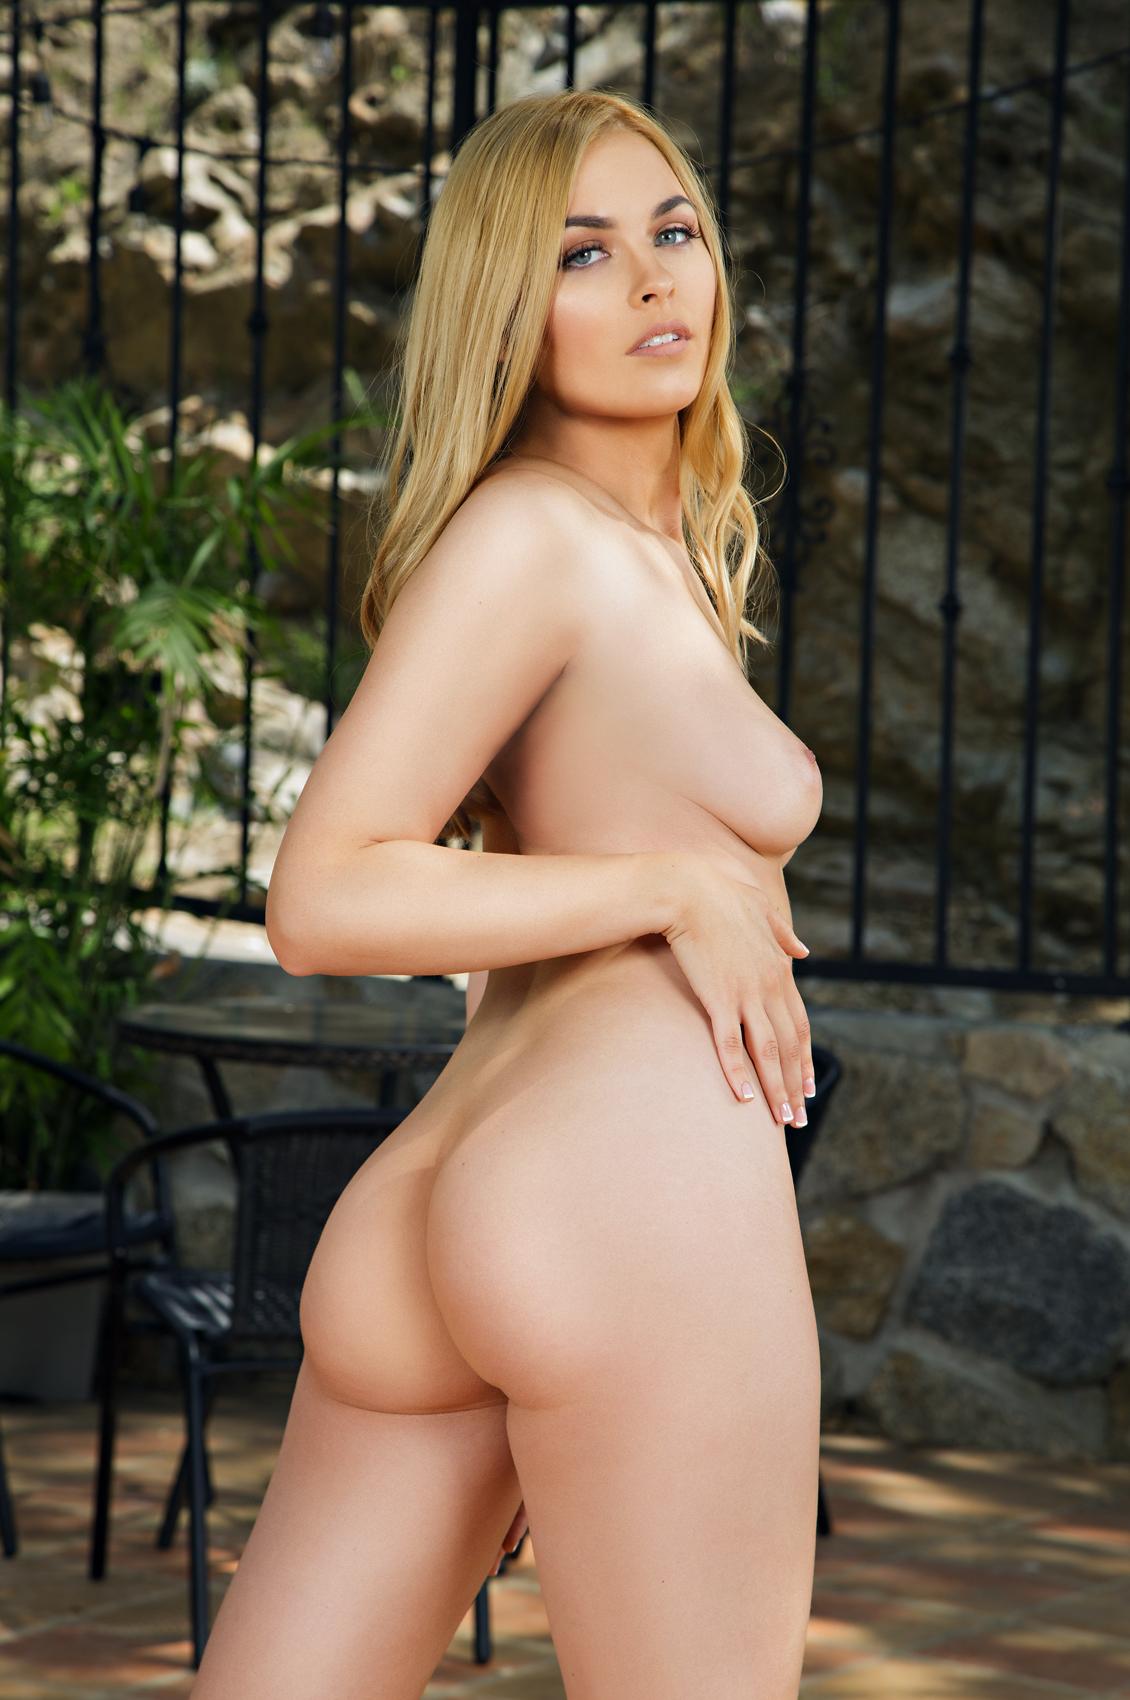 Bailey Rayne's VR Porn Videos, Bio & Free Nude Pics